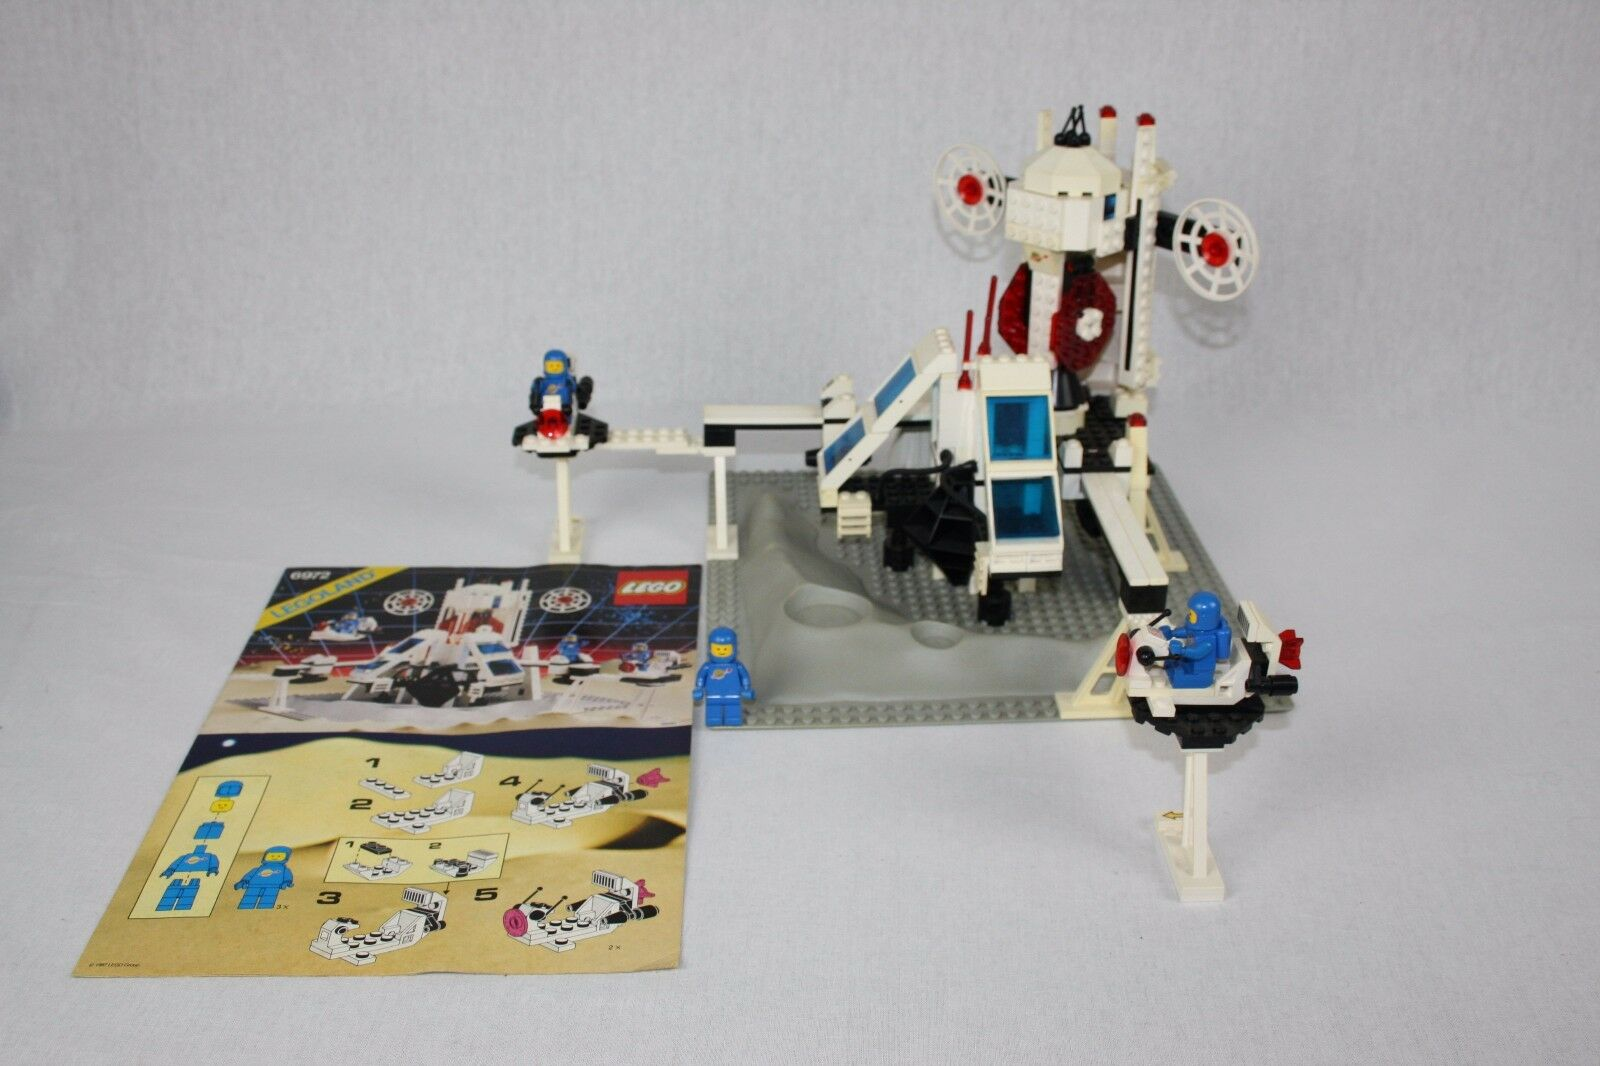 LEGO ® 6972 polaris space Lab station spatiale laboratoire Legoland Legoland Legoland Clssic spatiale rare 851082